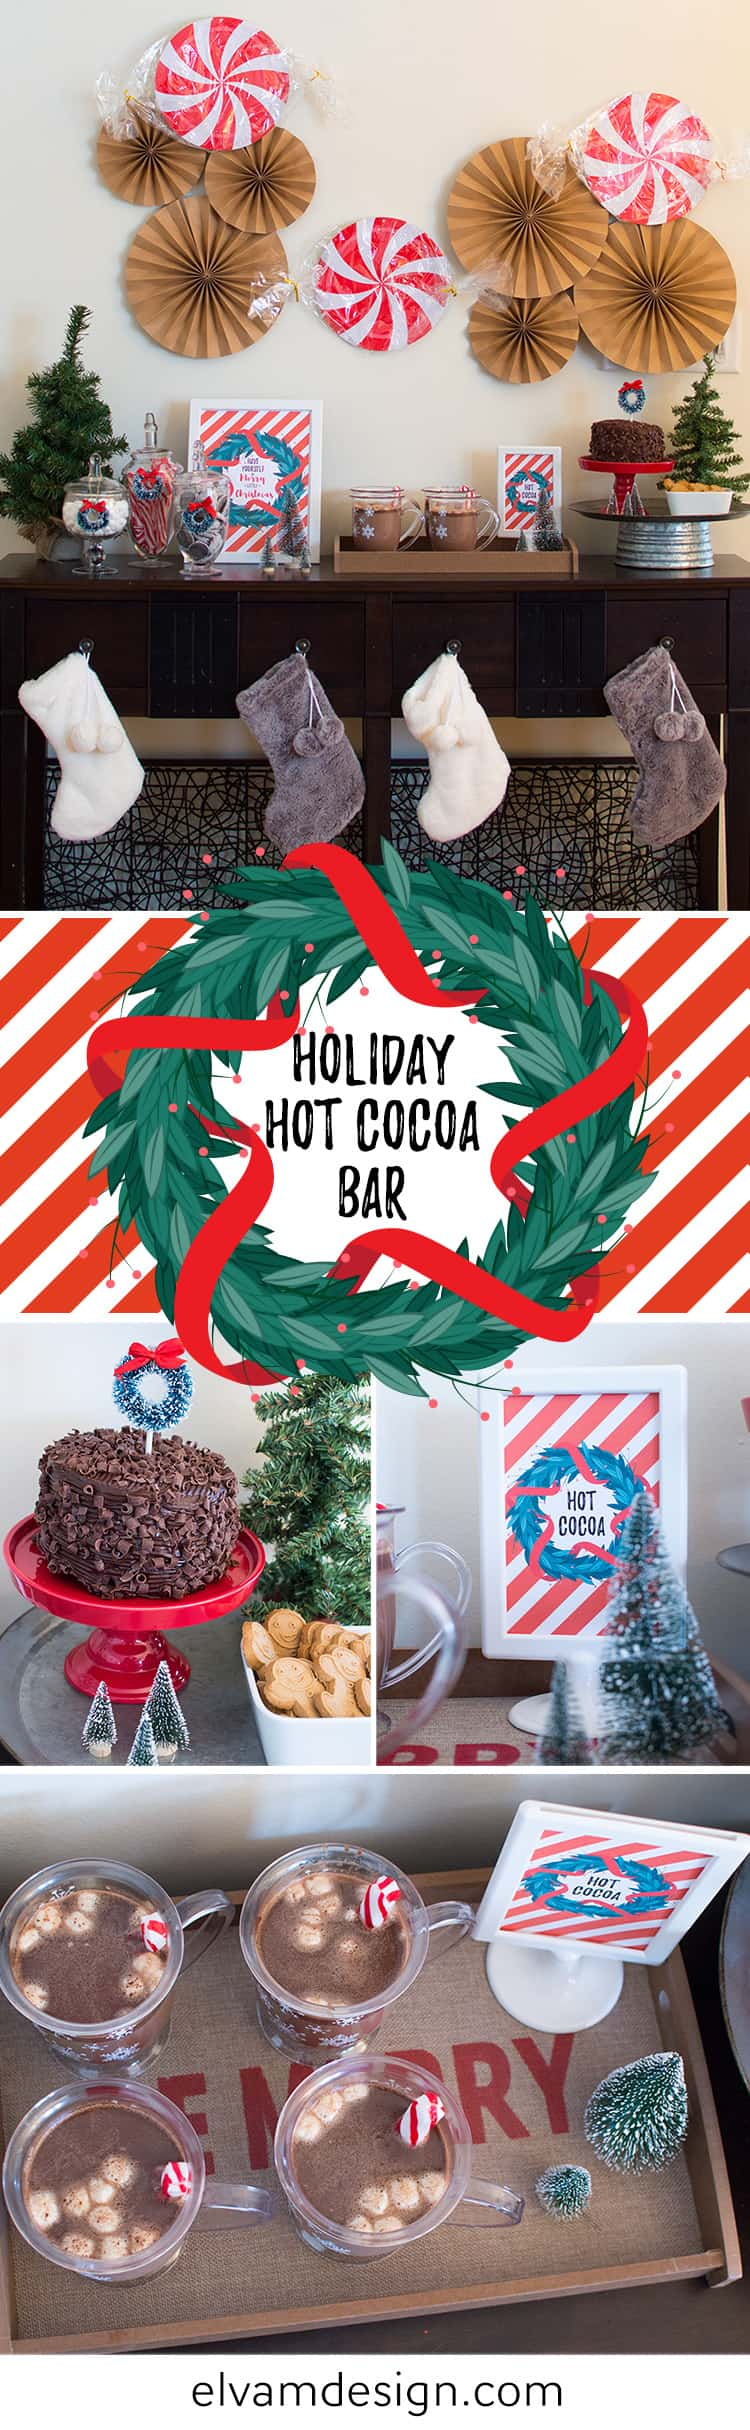 Holiday Hot Cocoa Bar by Elva M Design Studio